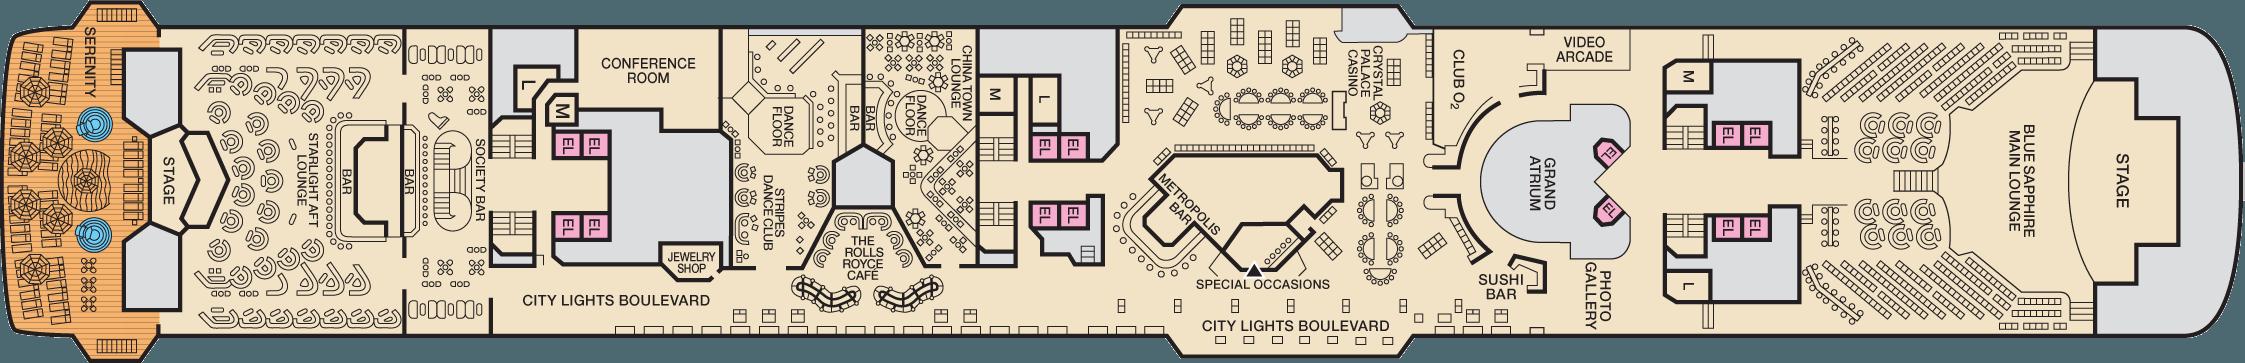 Deck 9 Promenade